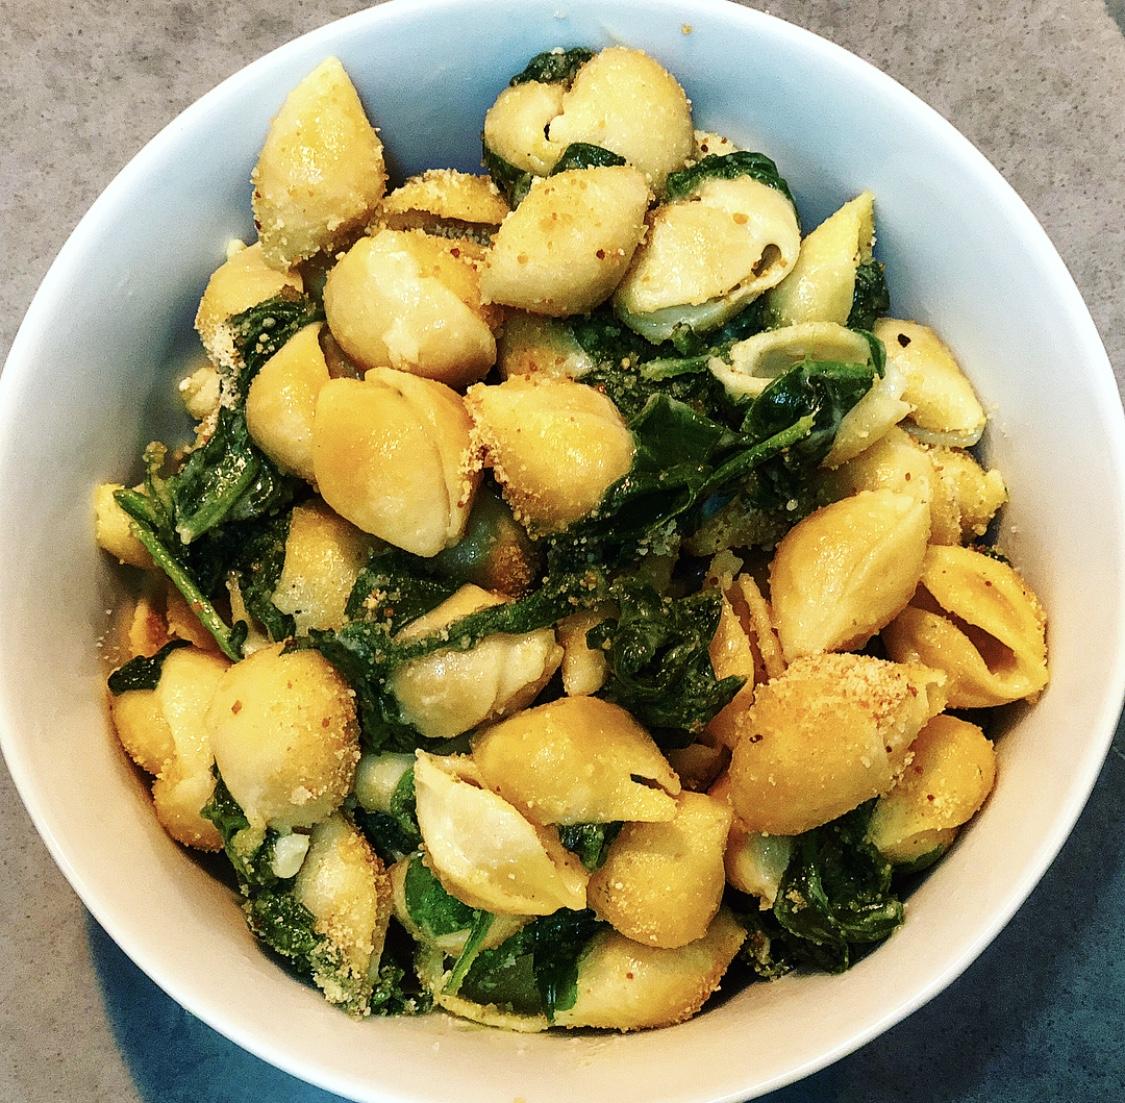 Parmesan spinach.jpg